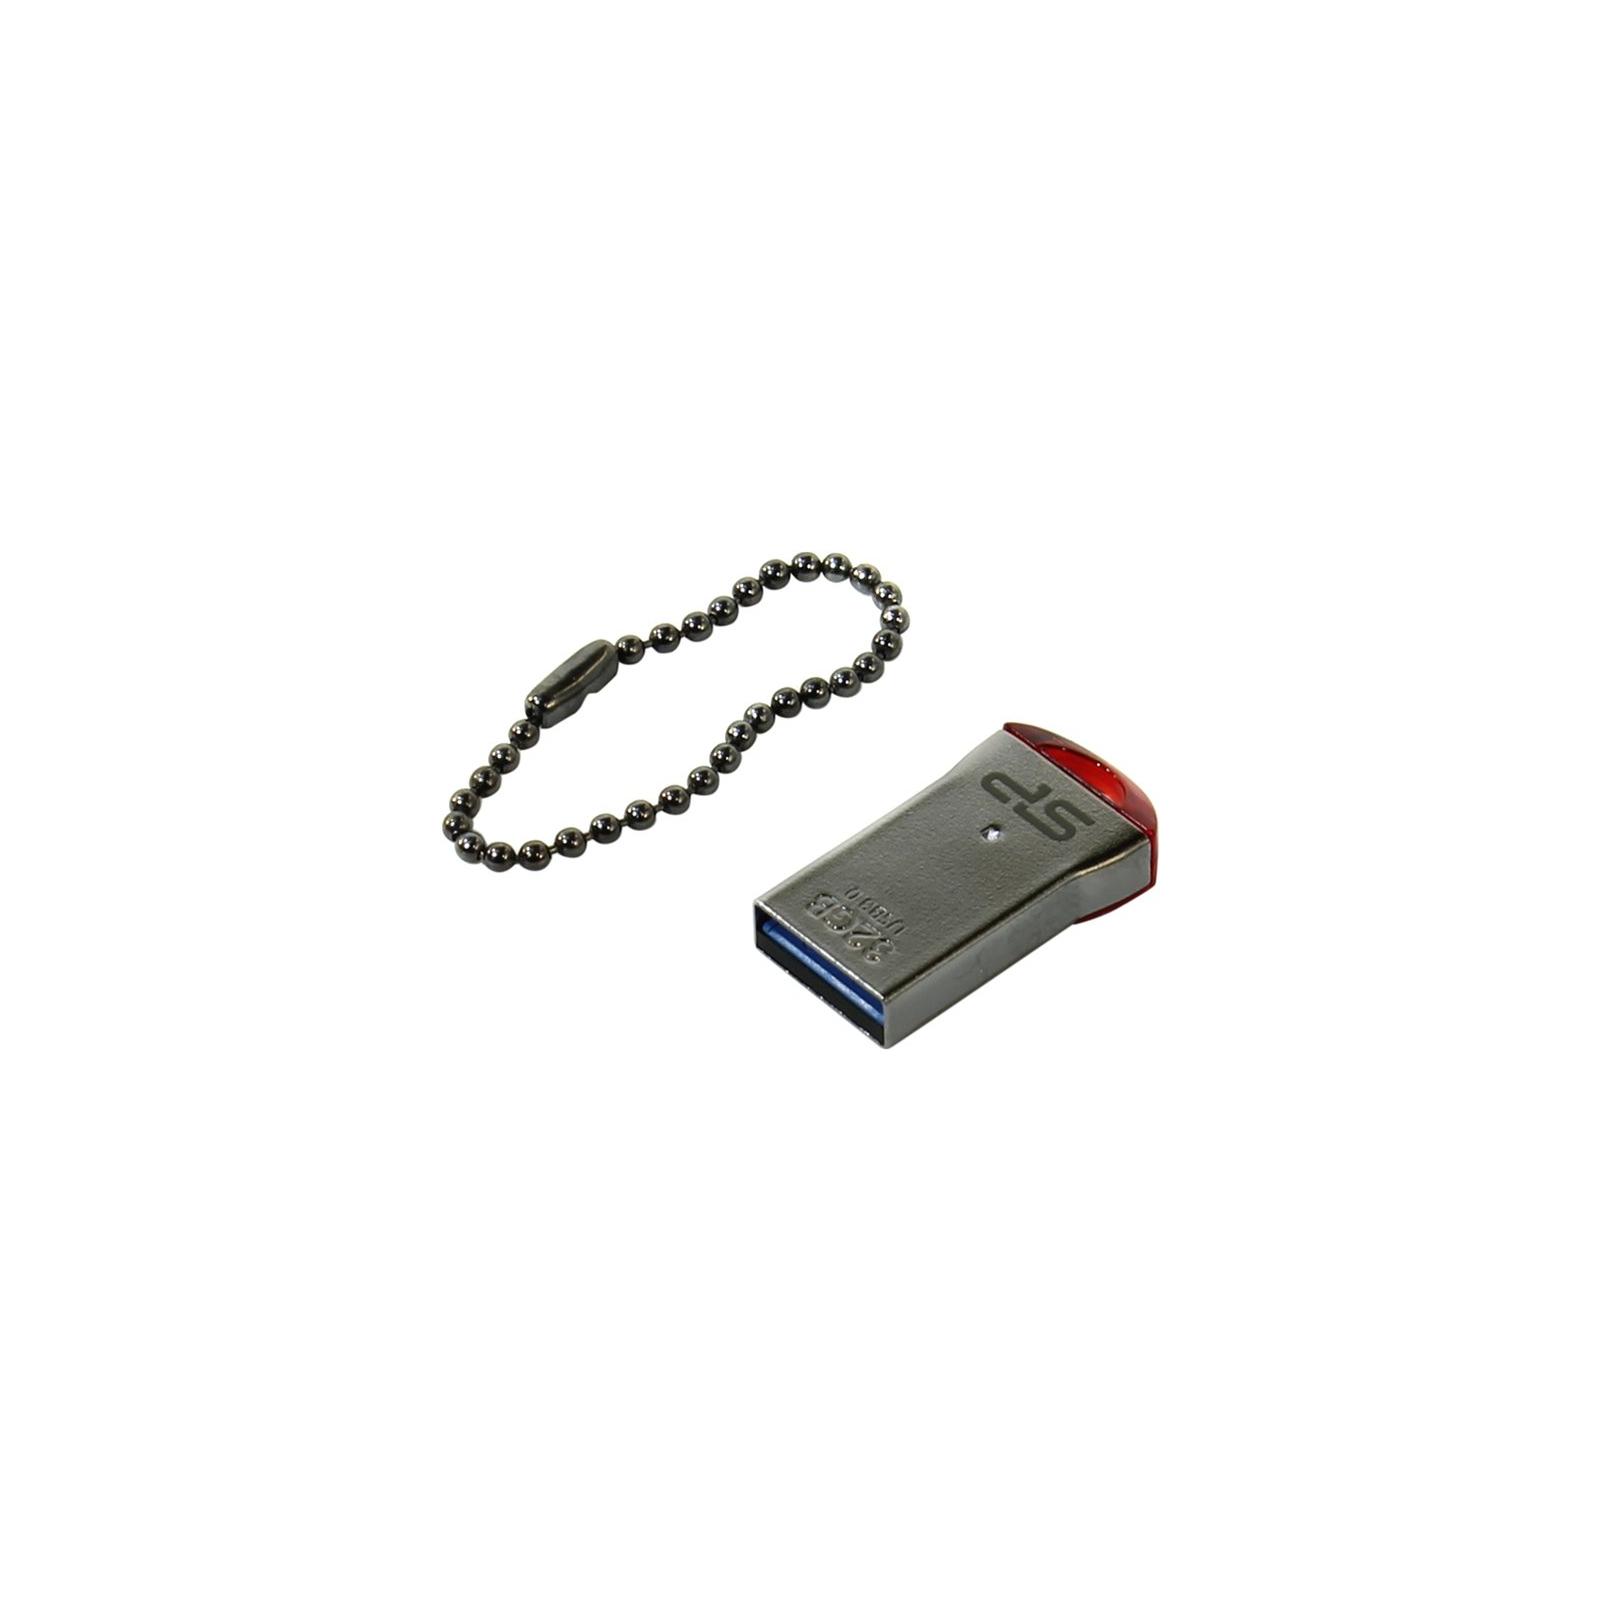 USB флеш накопитель Silicon Power 32GB JEWEL J01 RED USB 3.0 (SP032GBUF3J01V1R) изображение 2